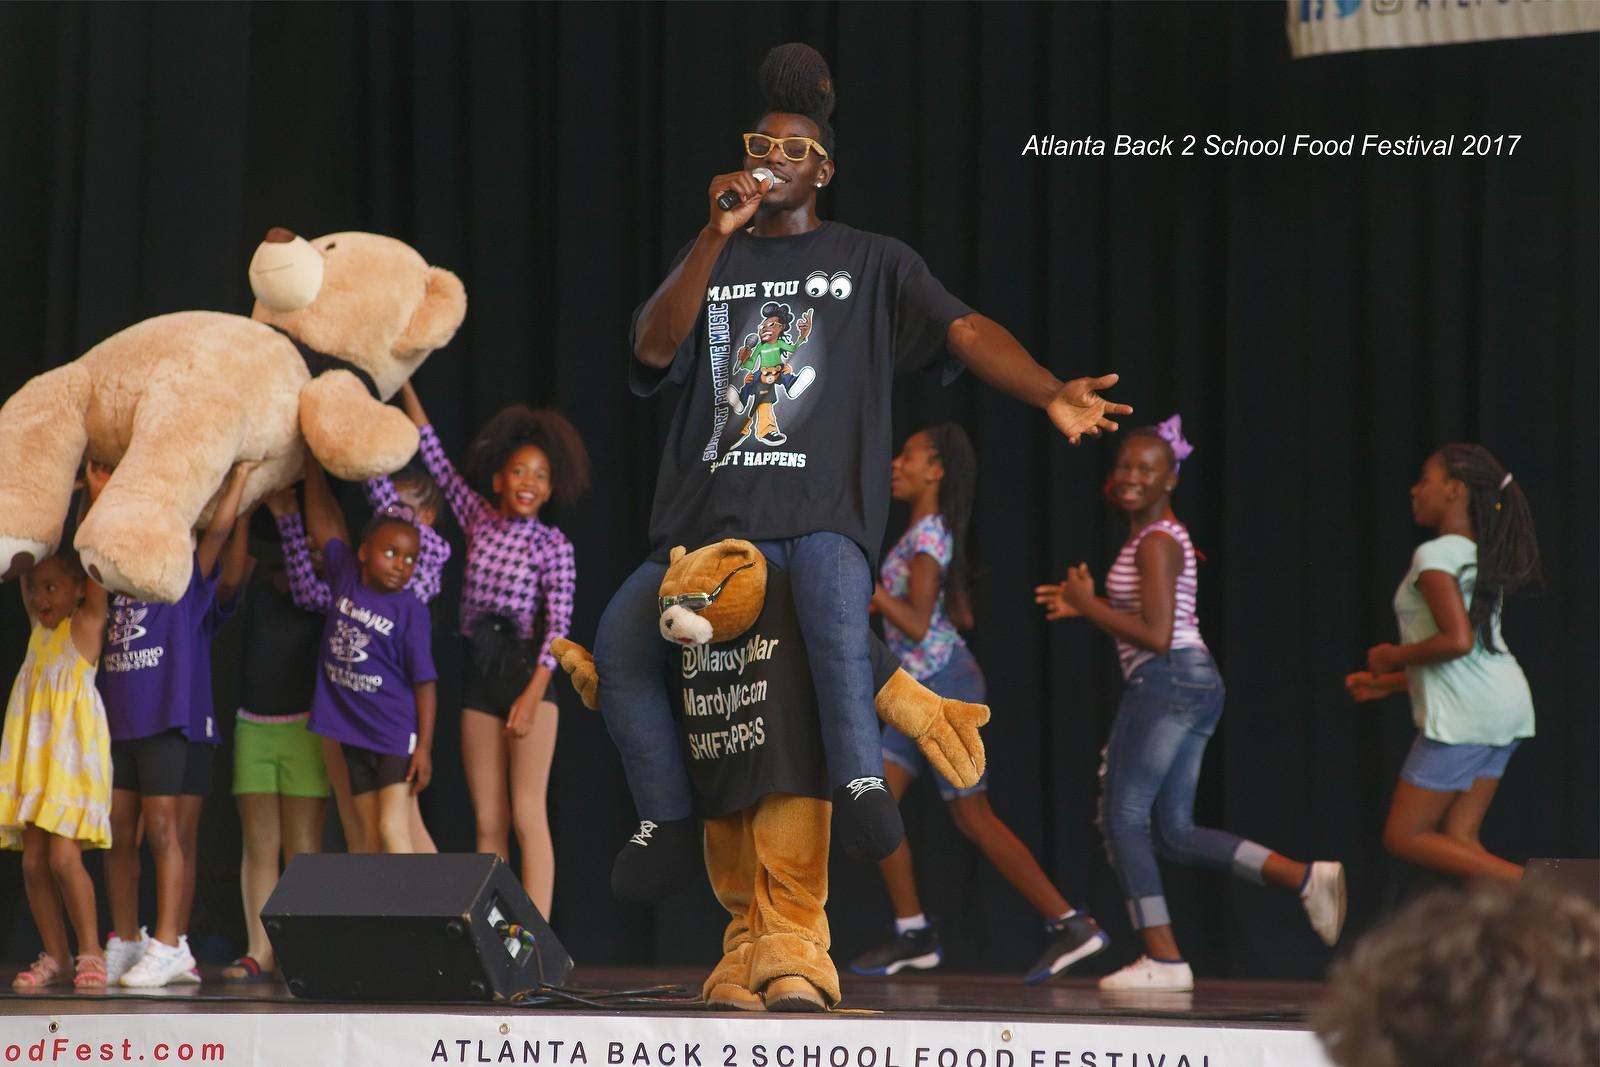 Atlanta Back to School Mardymar